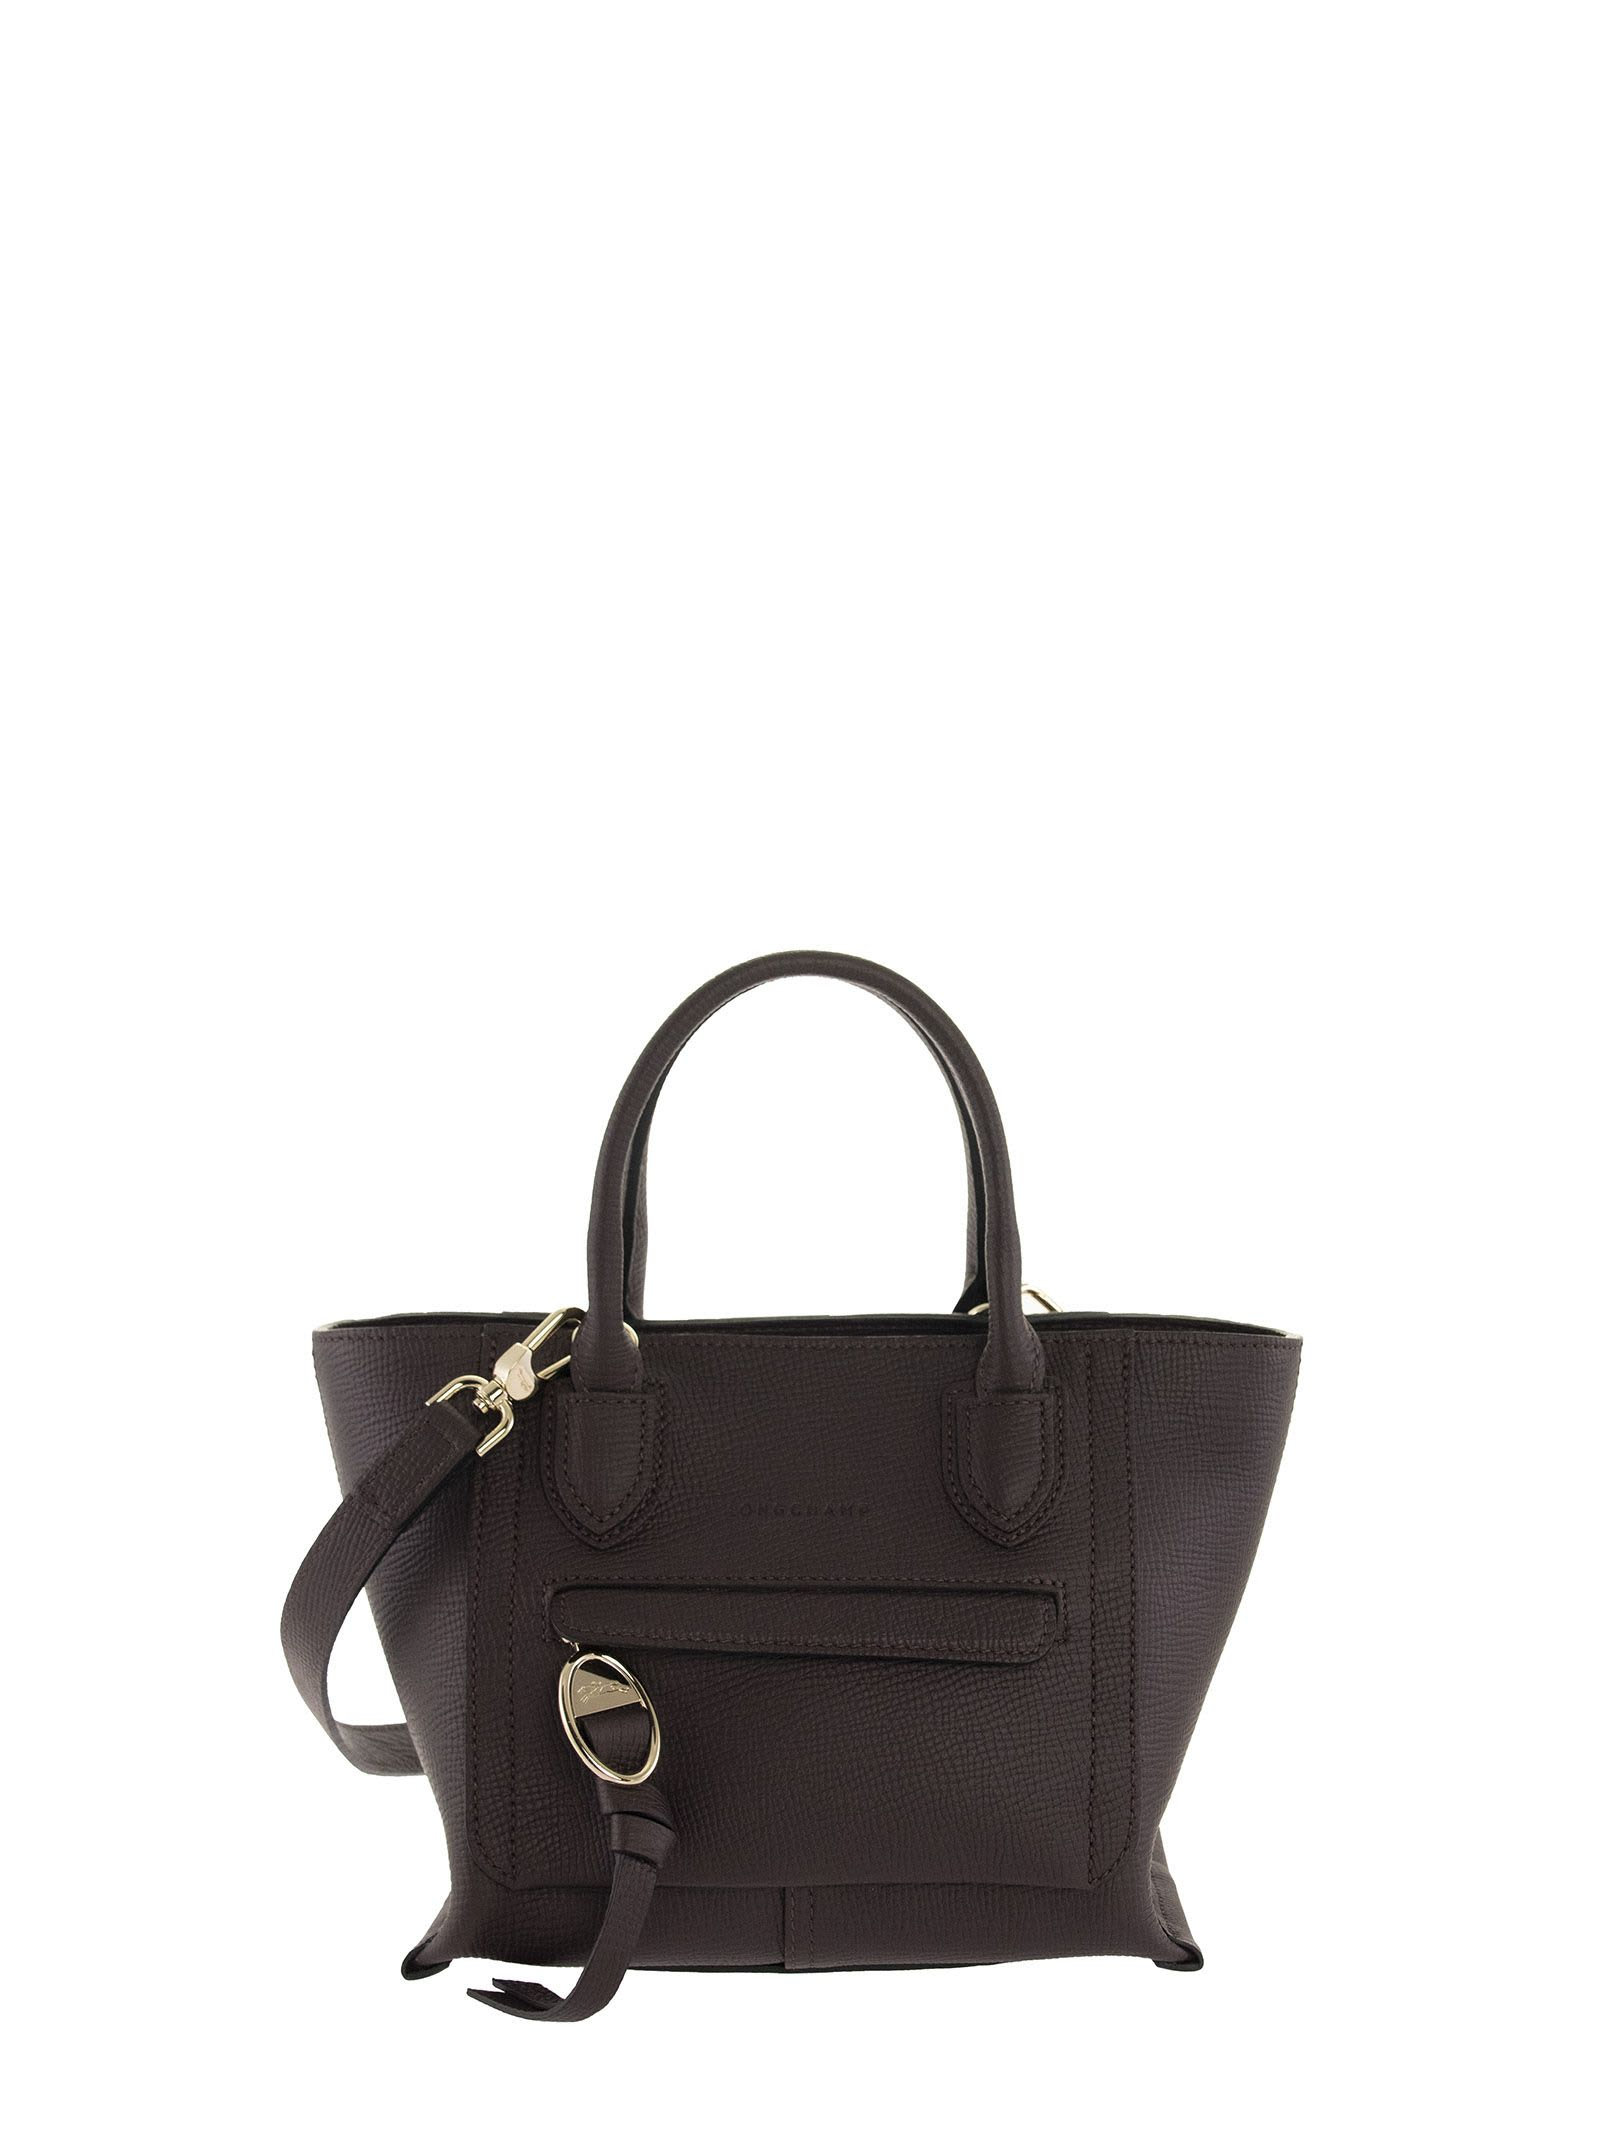 Longchamp MAILBOX BAG WITH HANDLE S